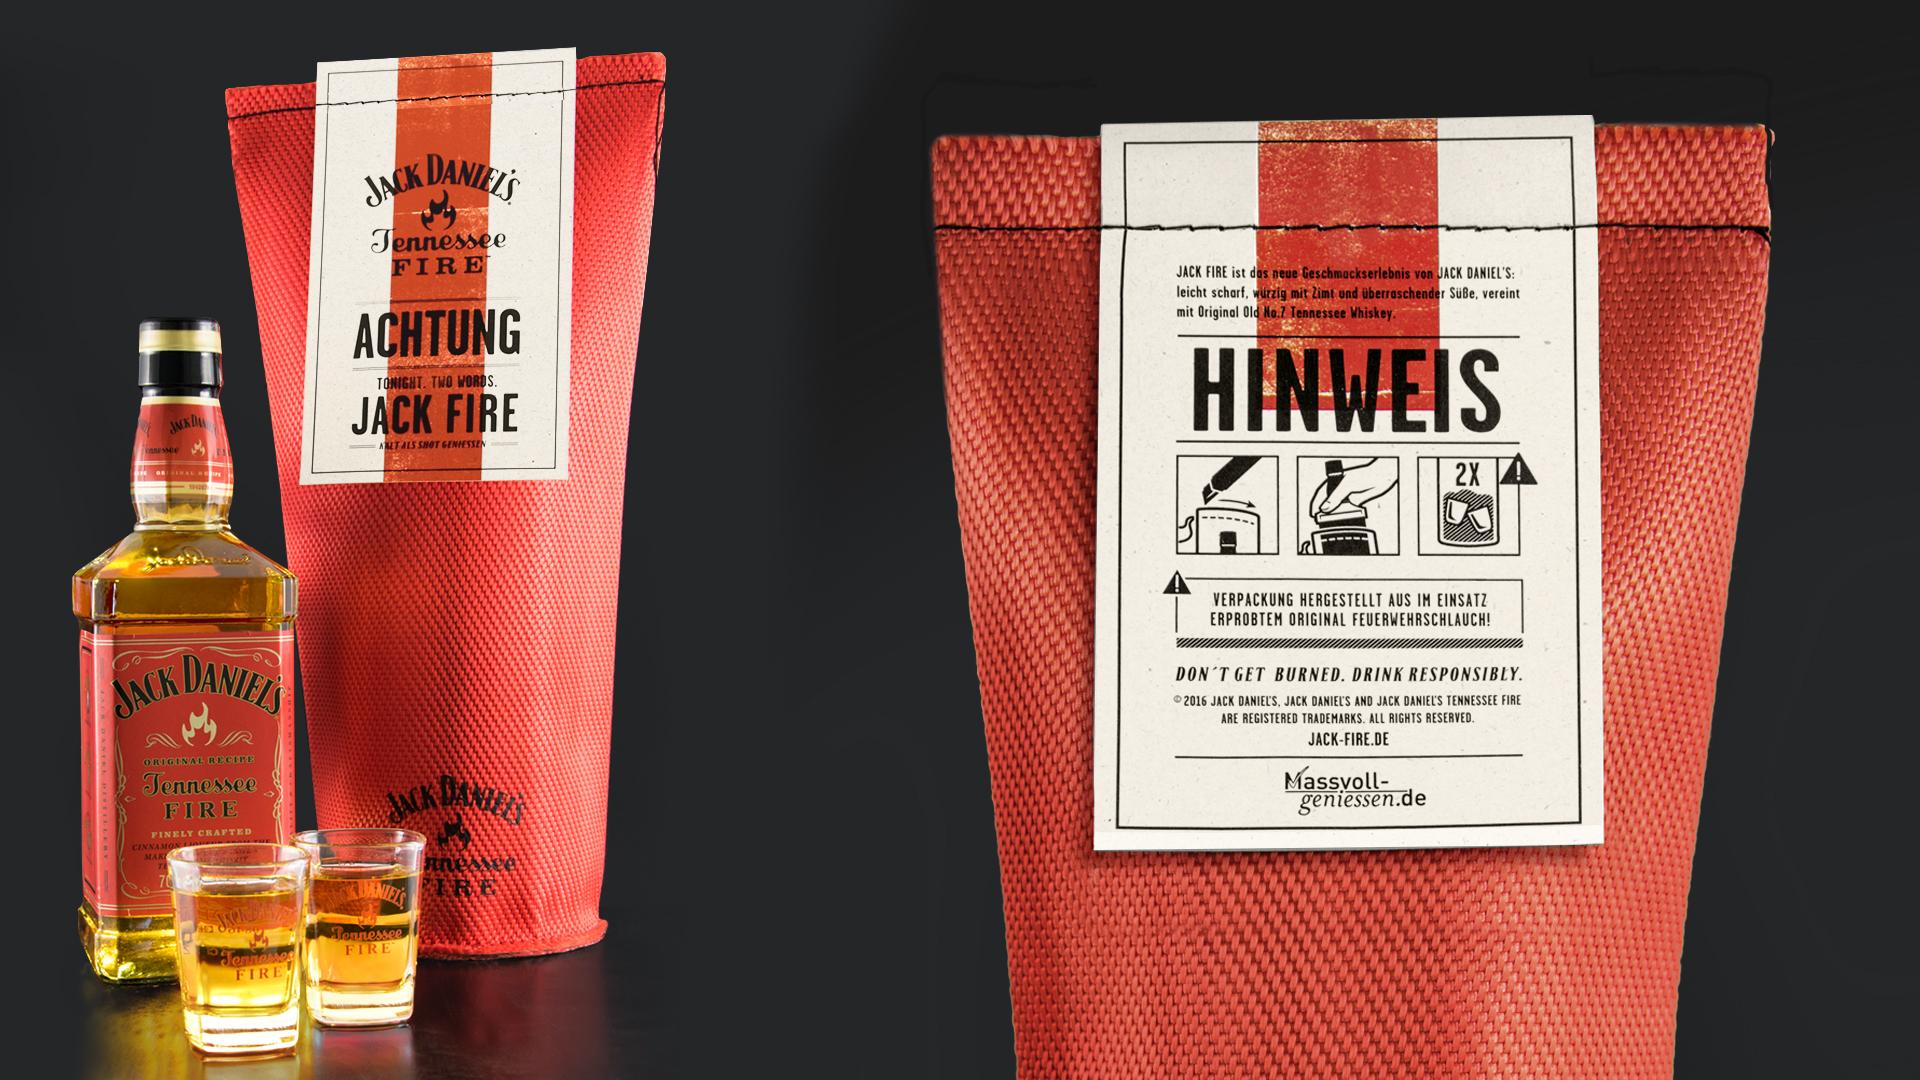 Higgins Design Wrapped Jack Daniels Tennessee Fire in Original Fire Hoses